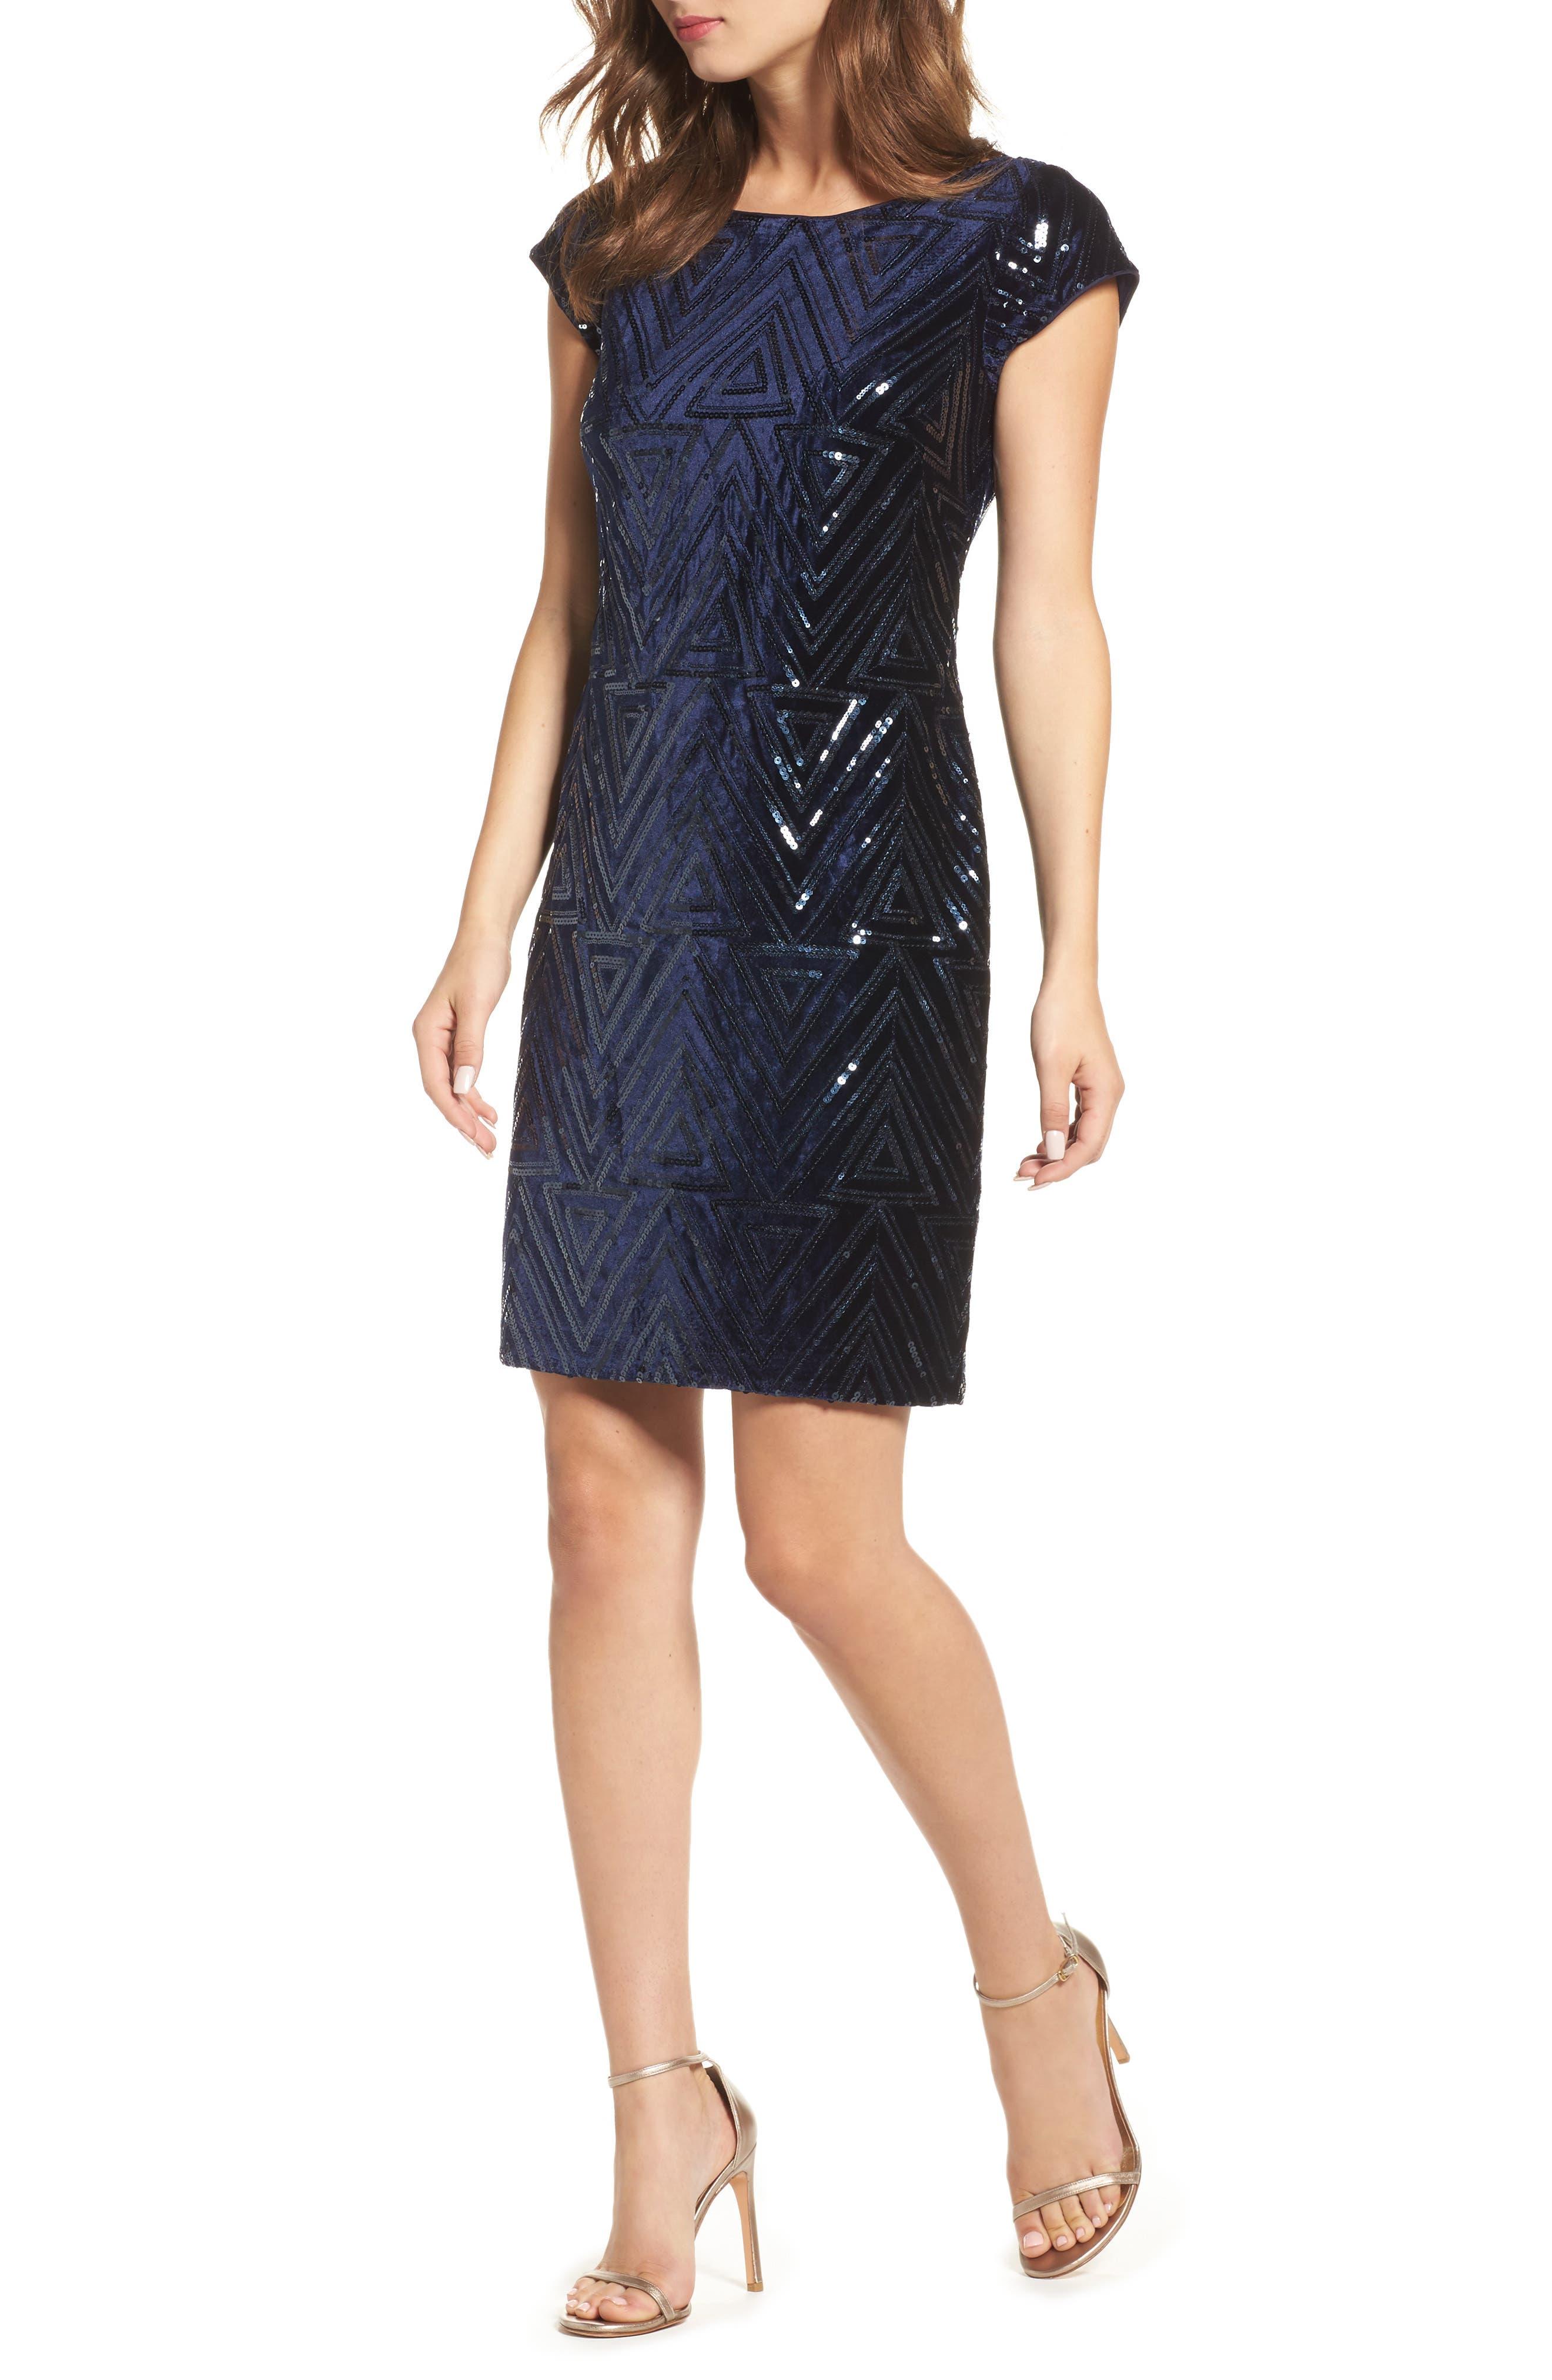 Short Homecoming Dresses Nordstrom 39